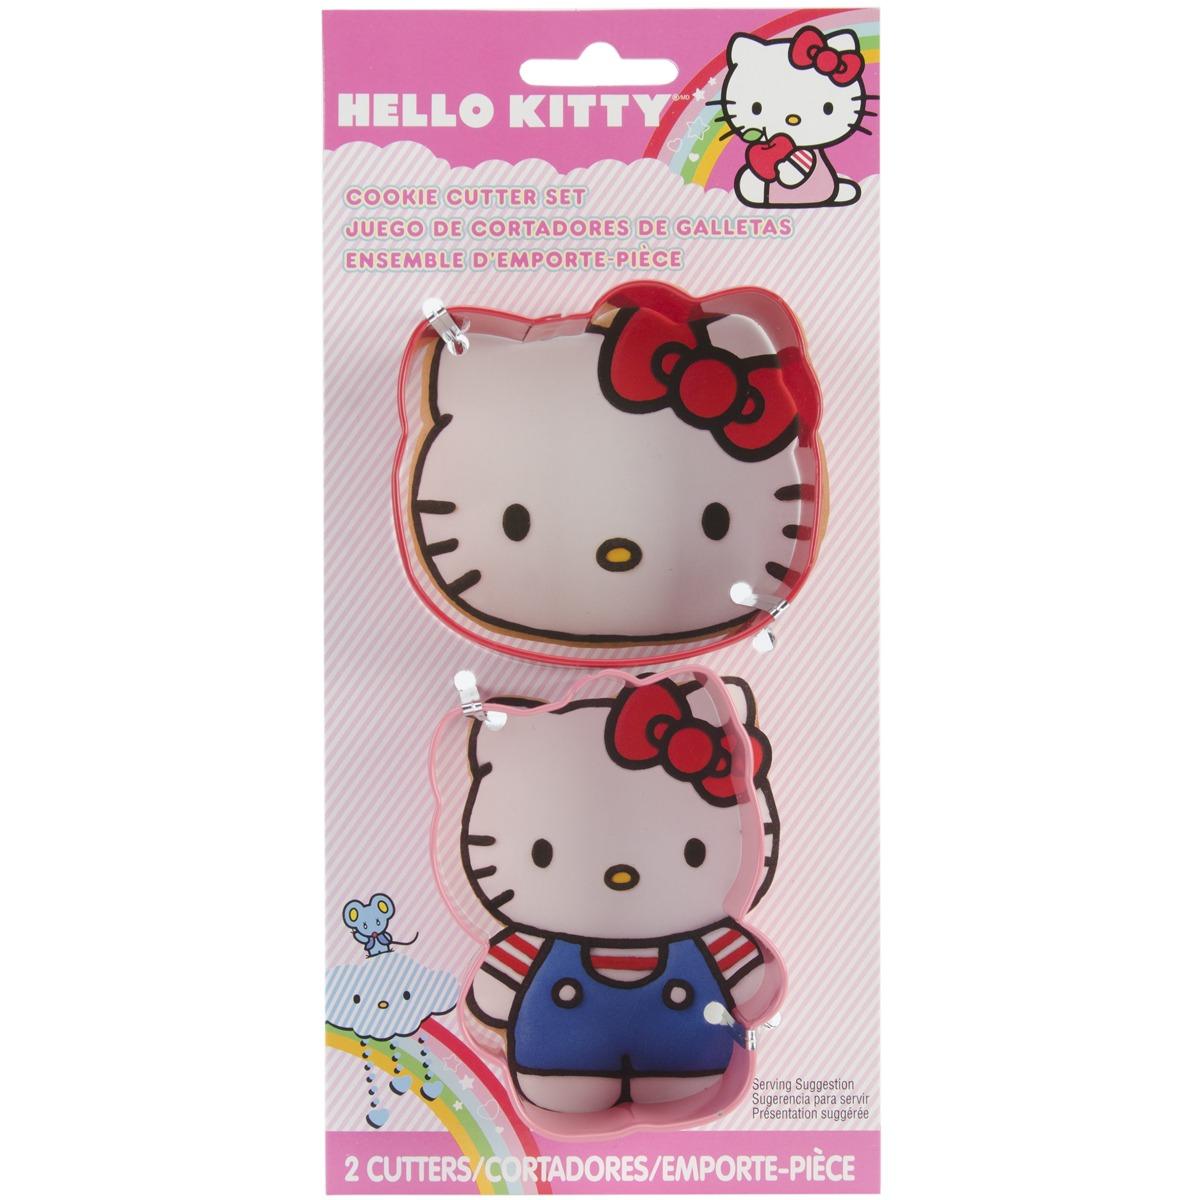 Wilton Hello Kitty Cookie Cutter Set